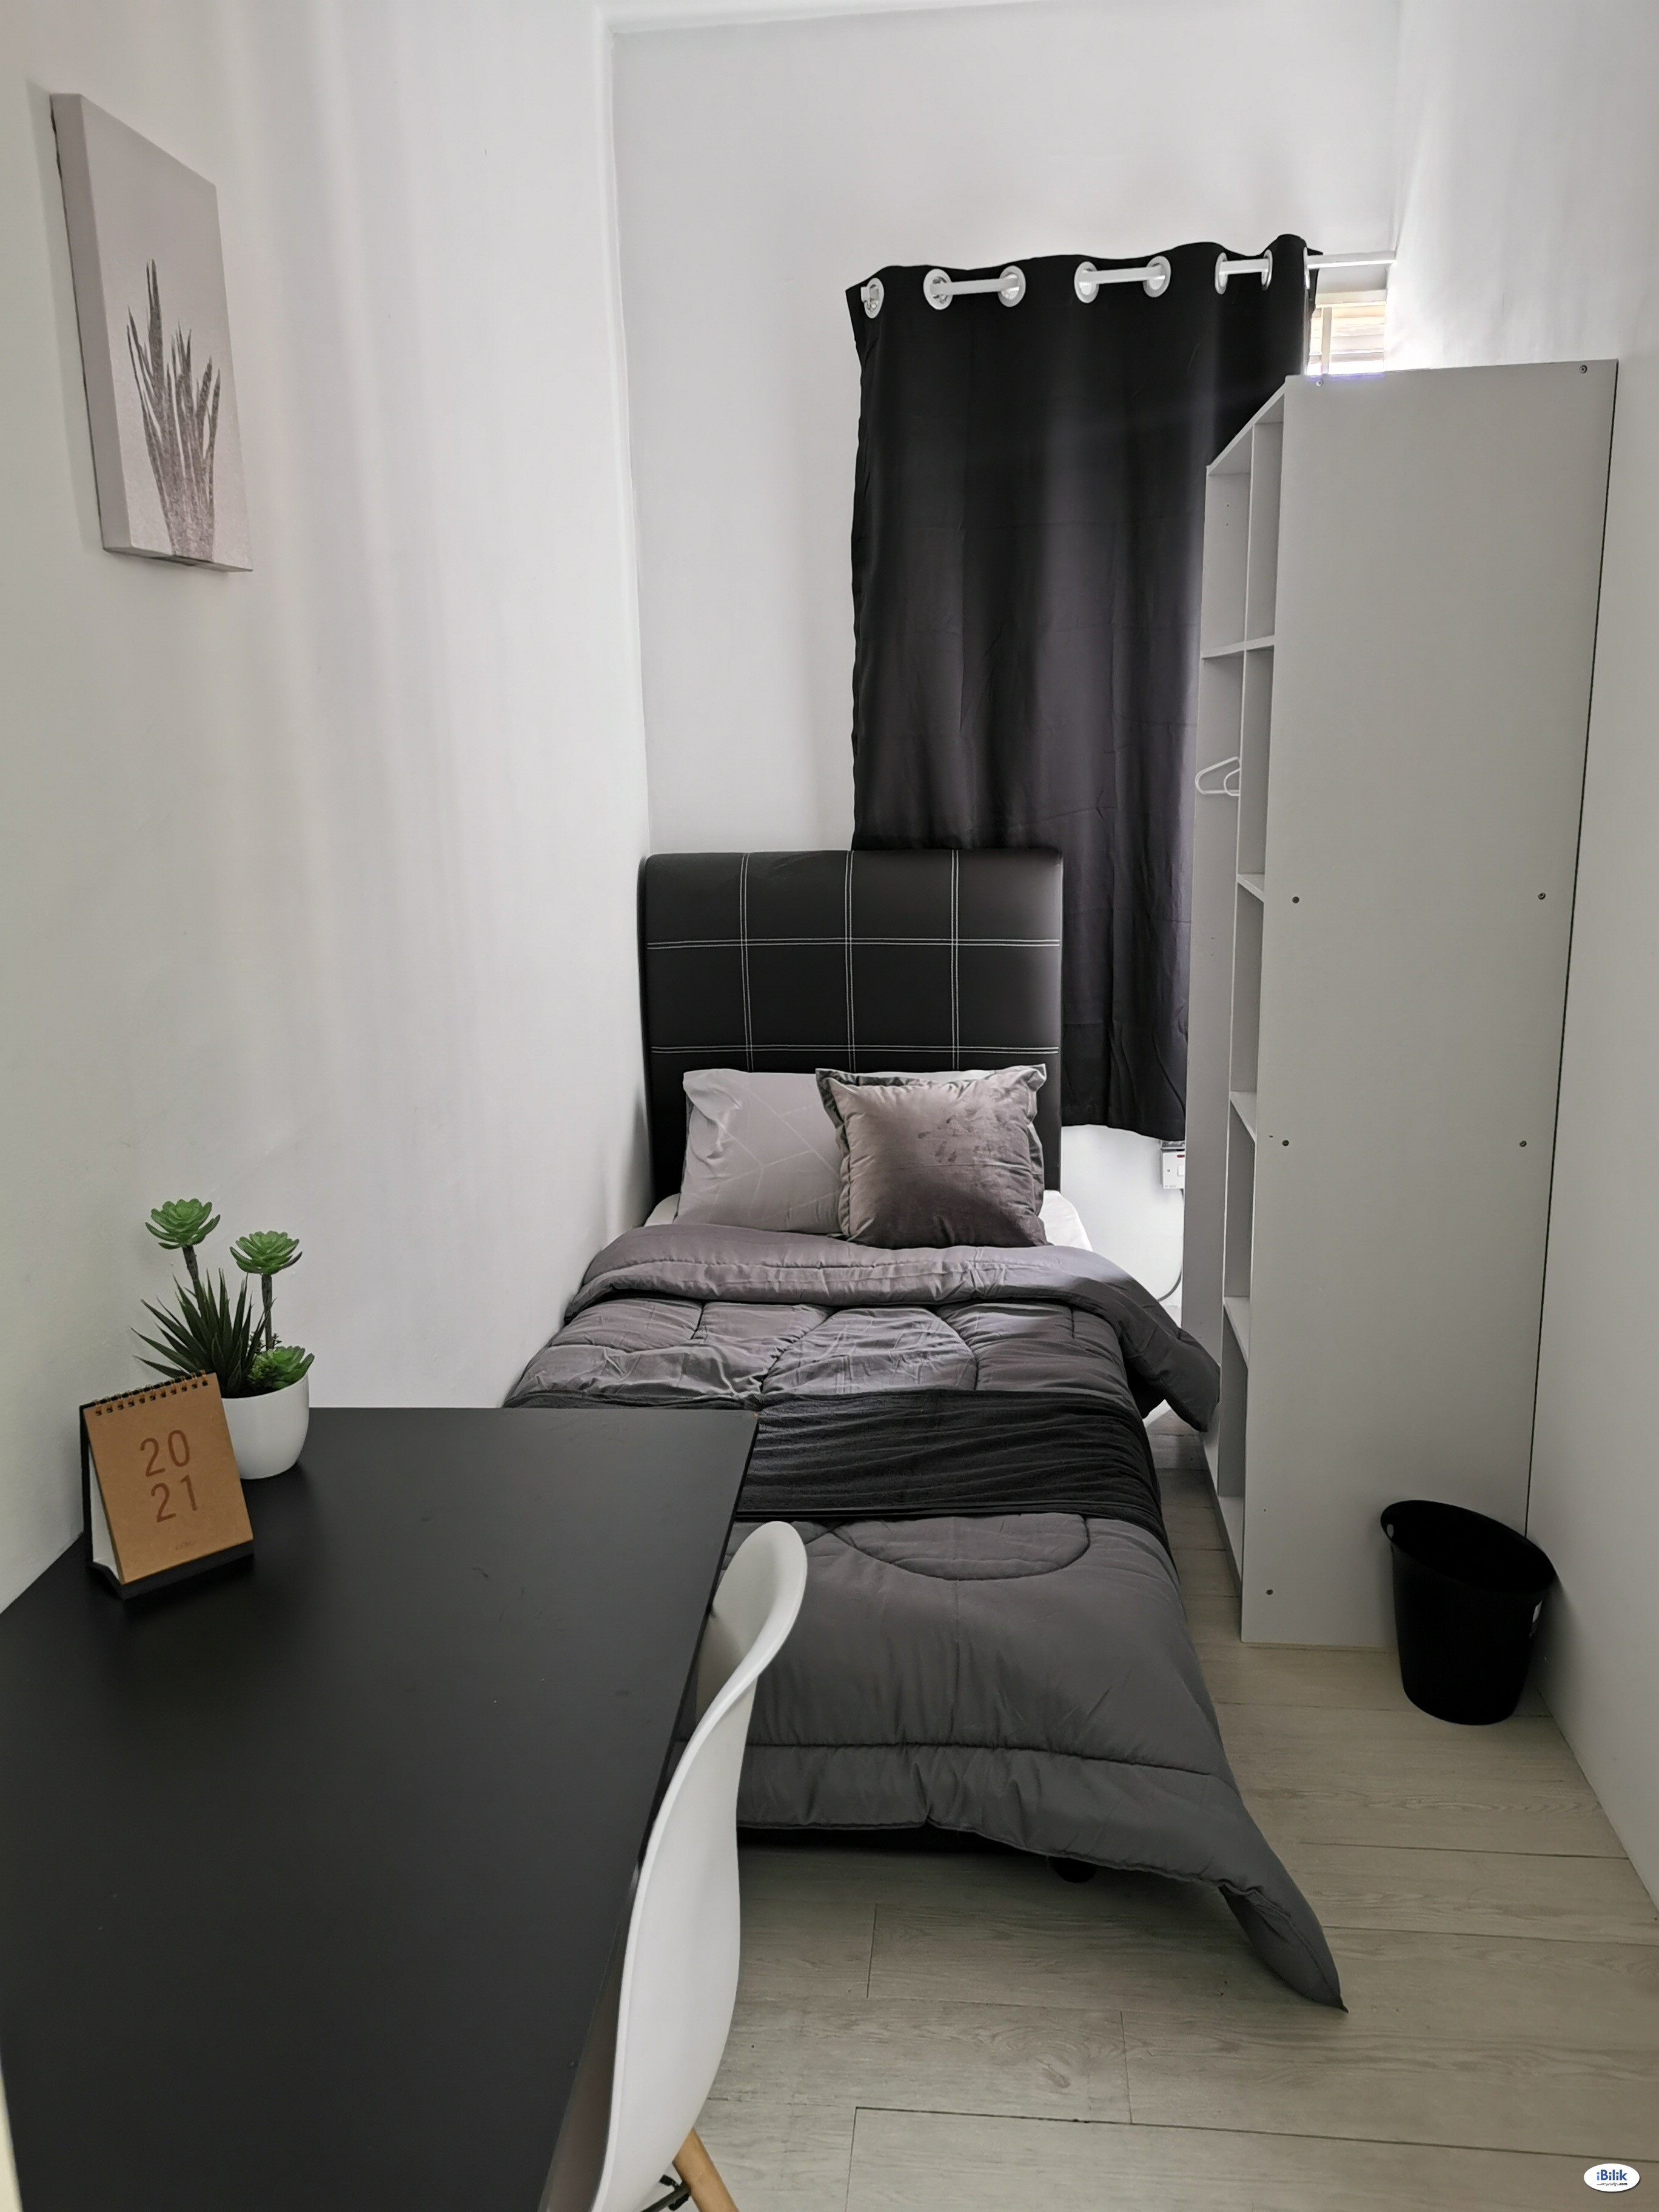 Single Room at Angkasa Condominiums, Cheras